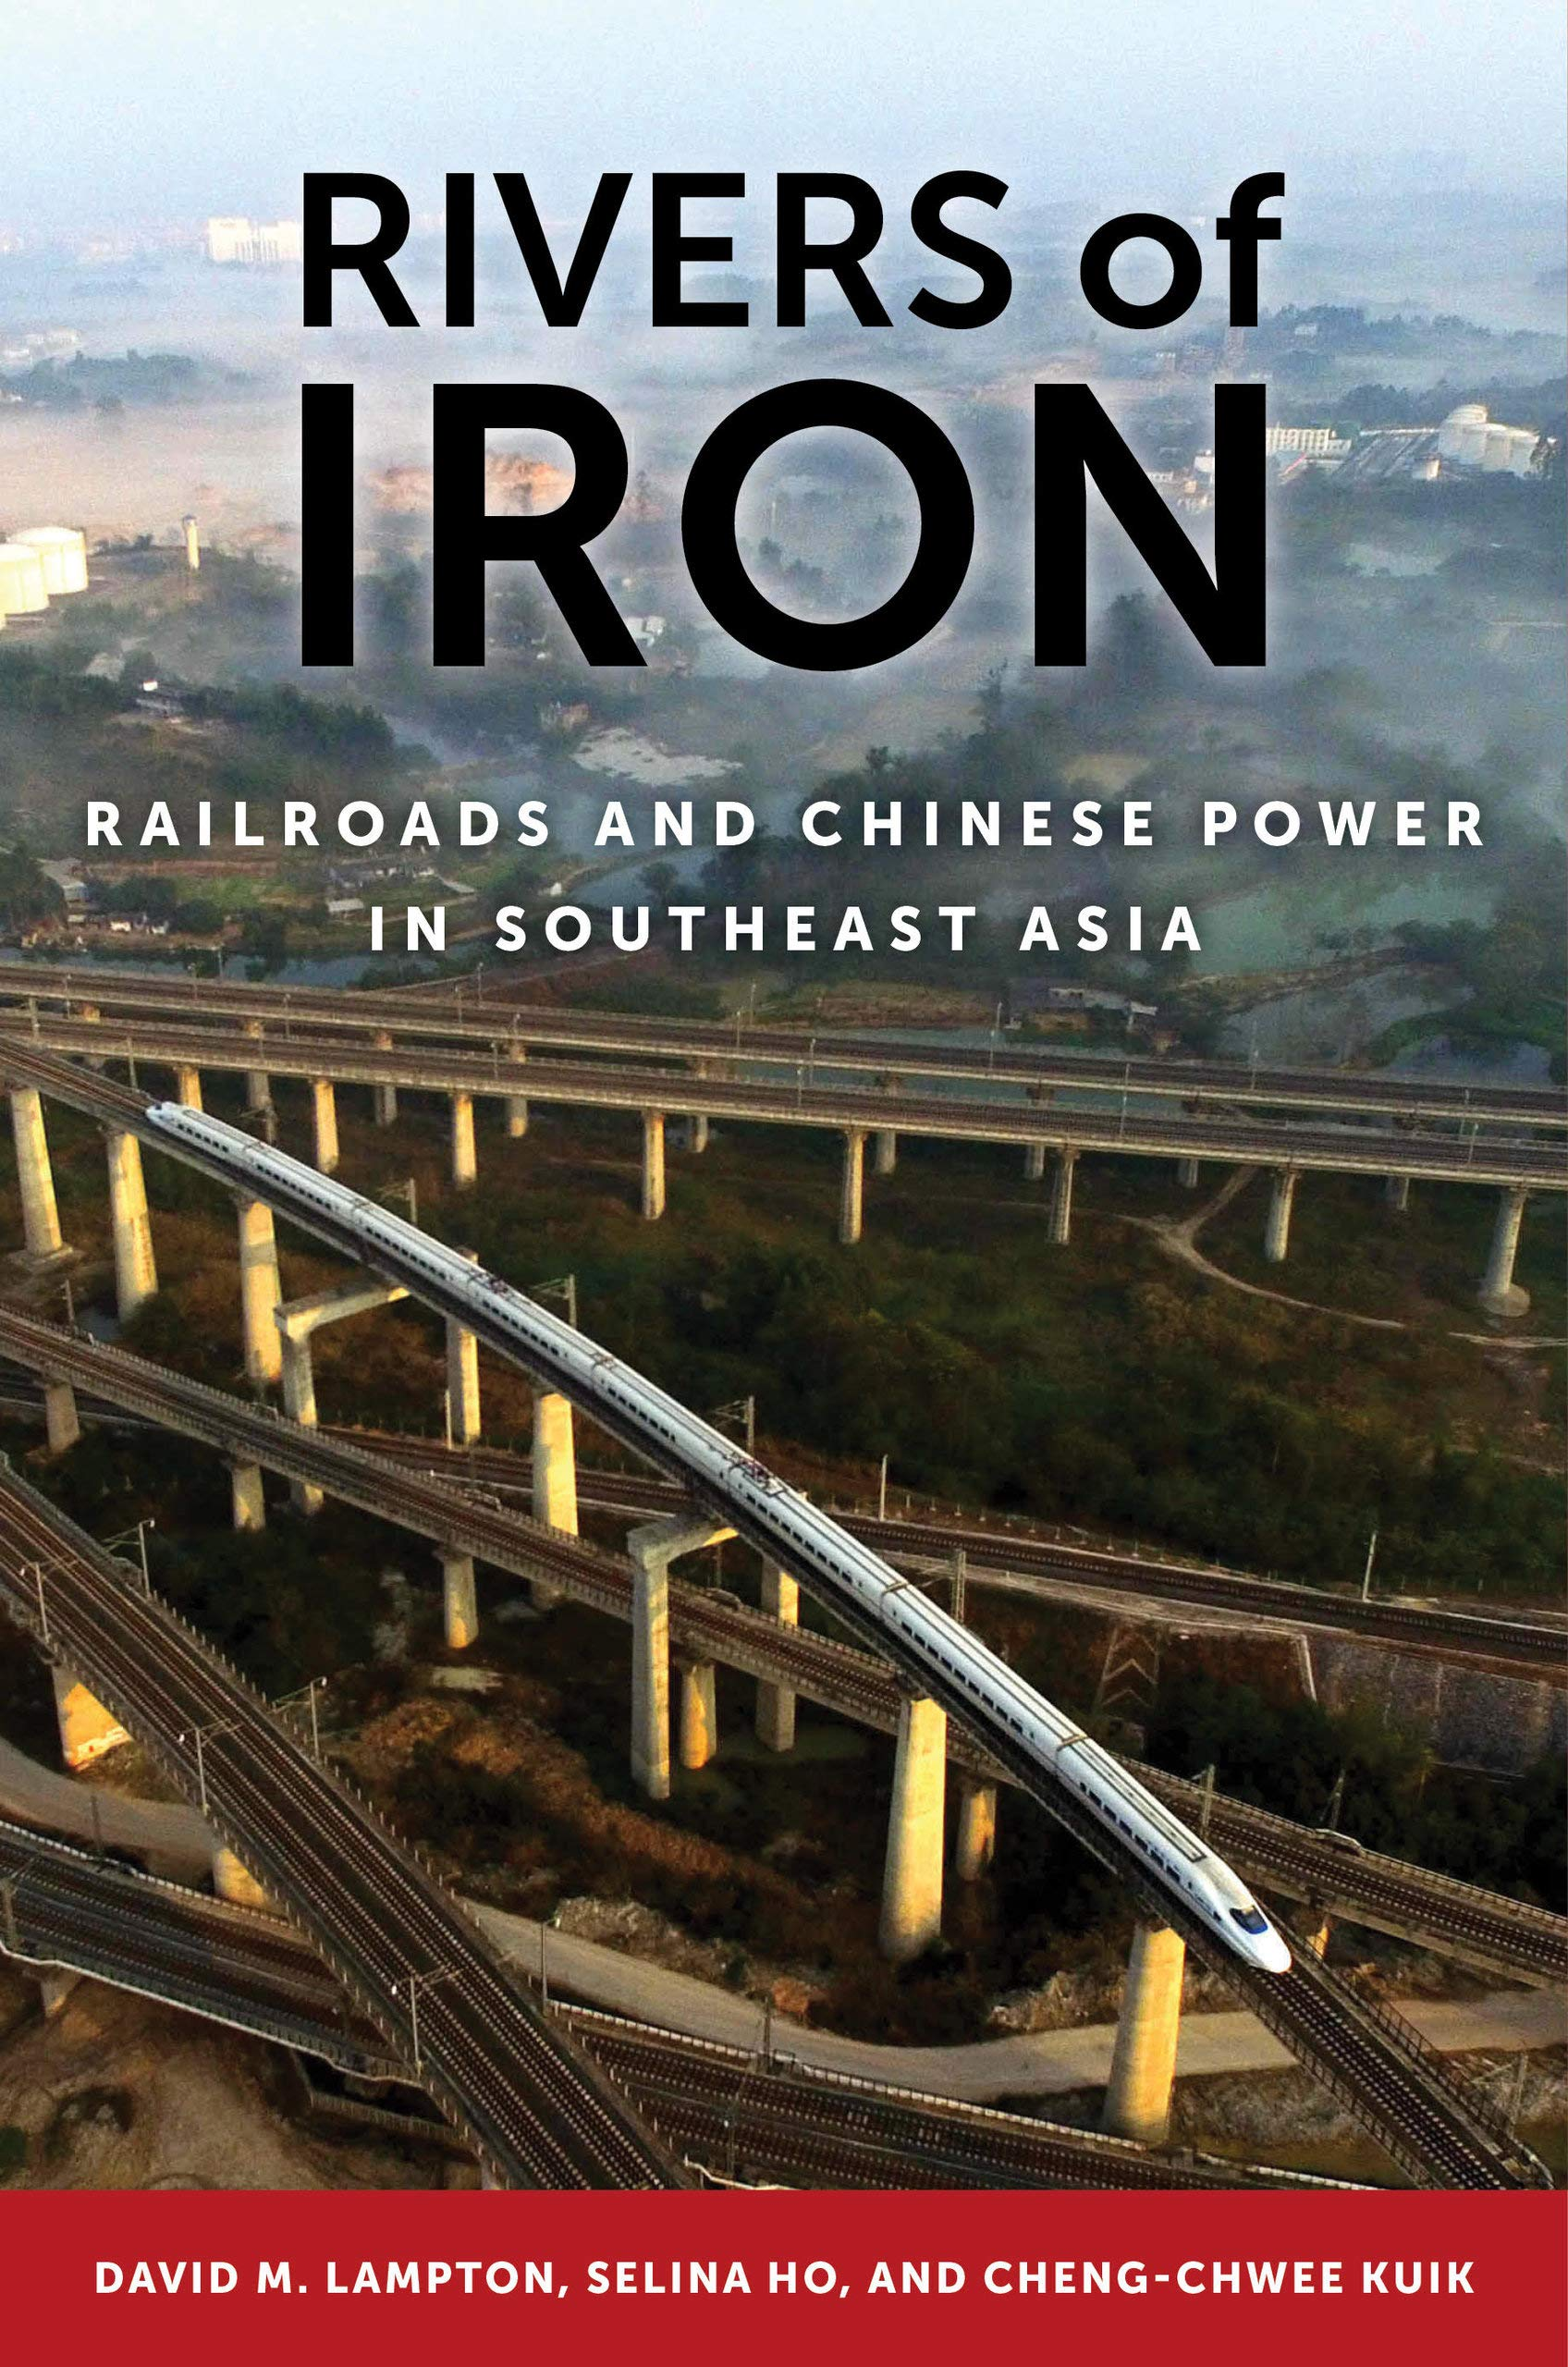 Rivers of Iron: Railroads and Chinese Power in Southeast Asia: Lampton,  David M., Ho, Selina, Kuik, Cheng-Chwee: 9780520372993